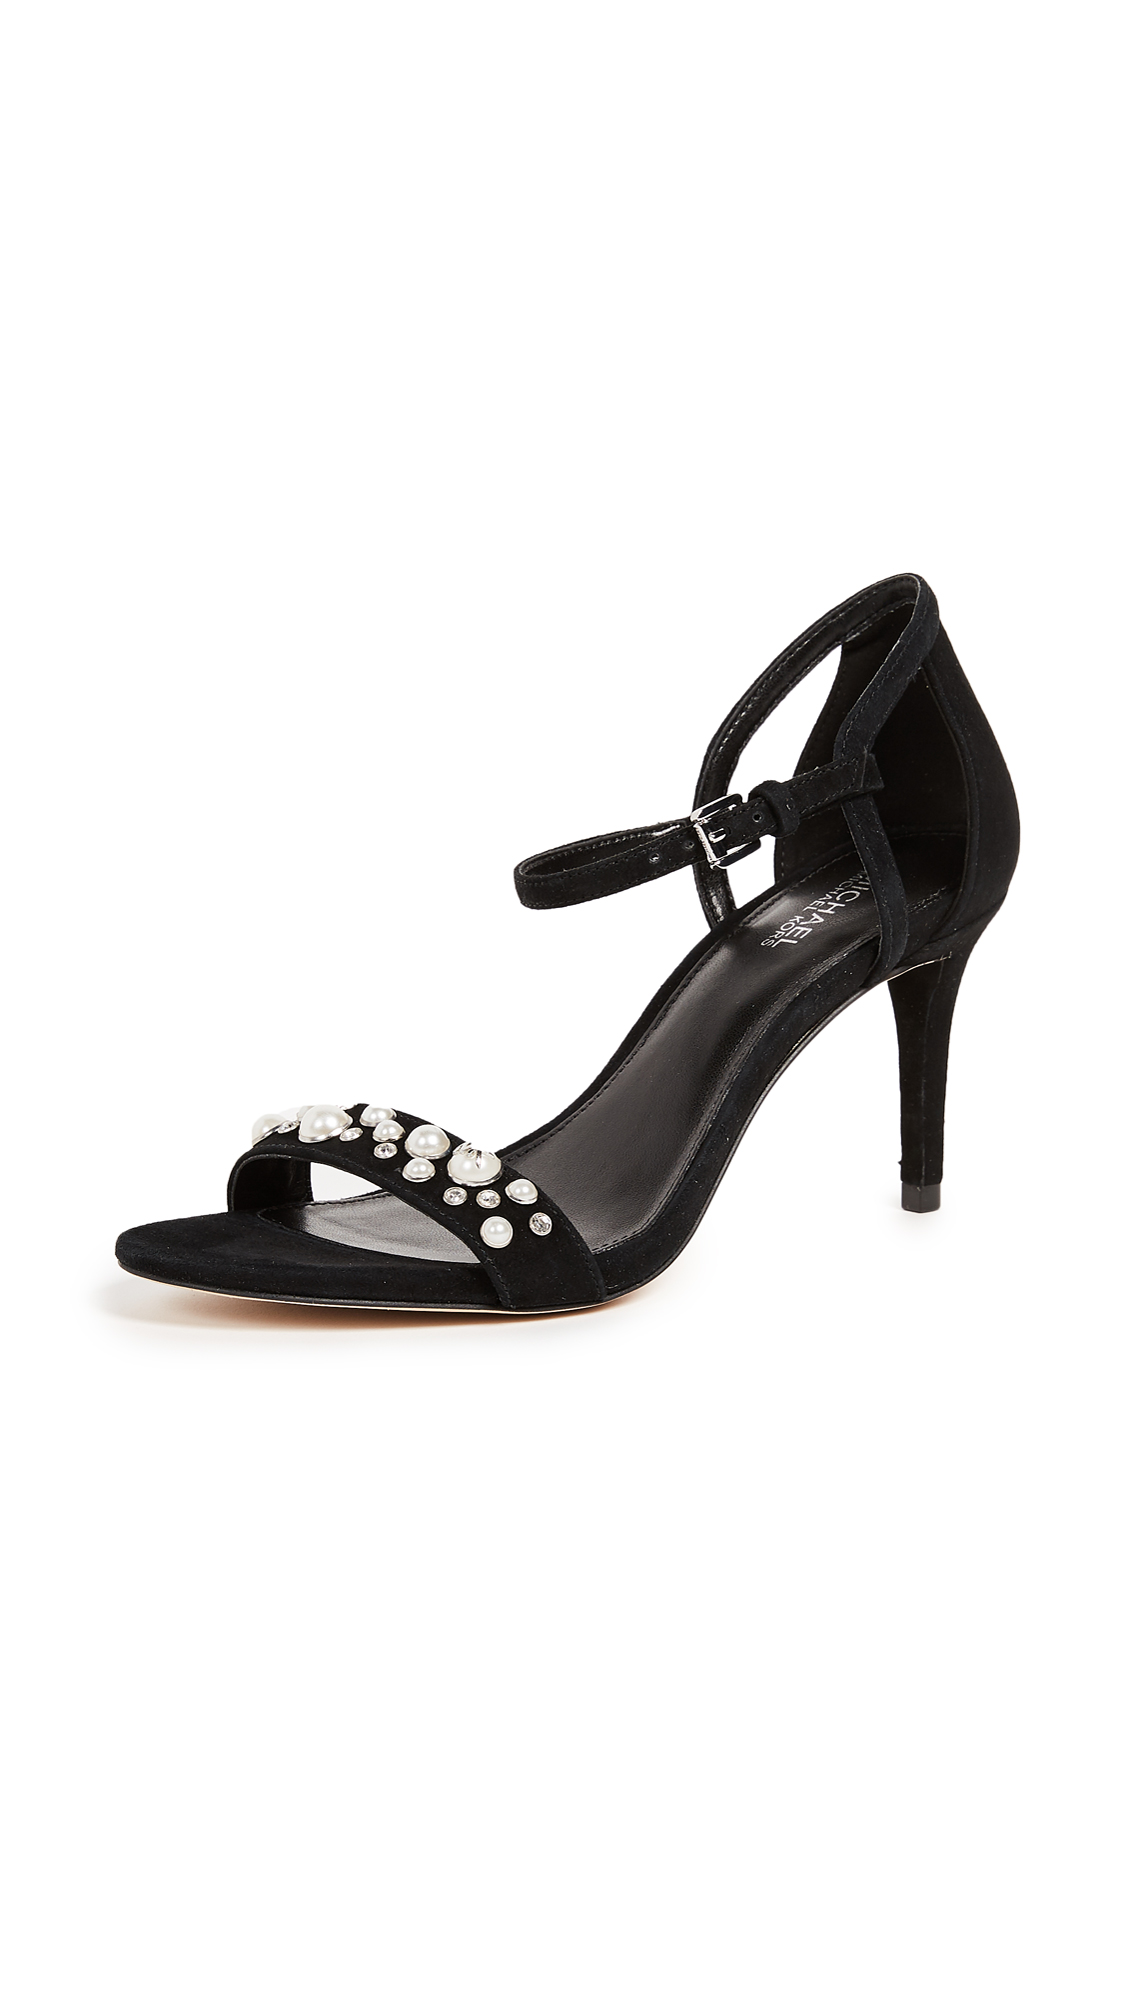 MICHAEL Michael Kors Simone Mid Sandals - Black